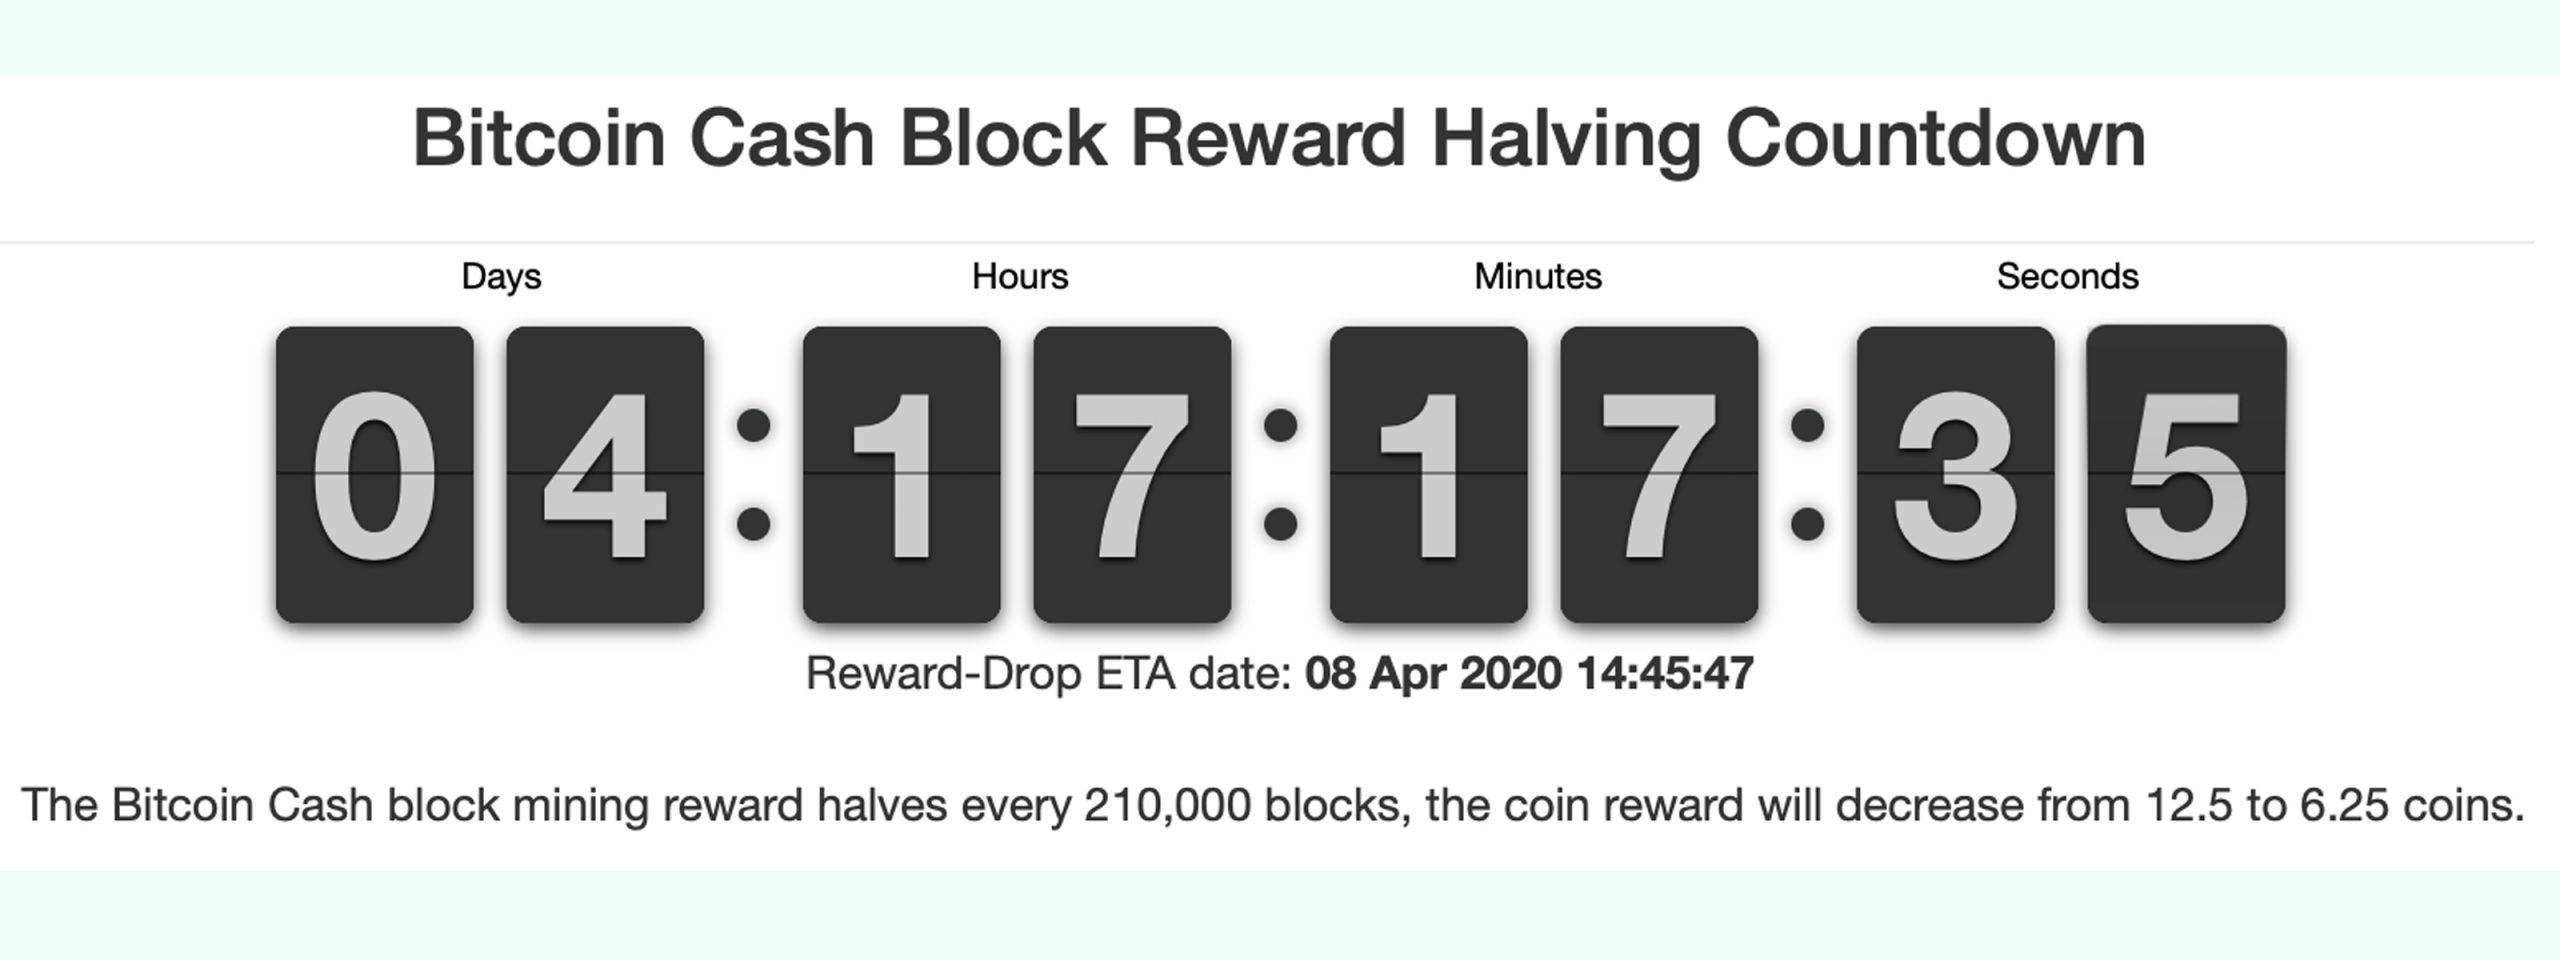 The Bitcoin Cash Halving Countdown - 50% Less Block Reward in 4 Days